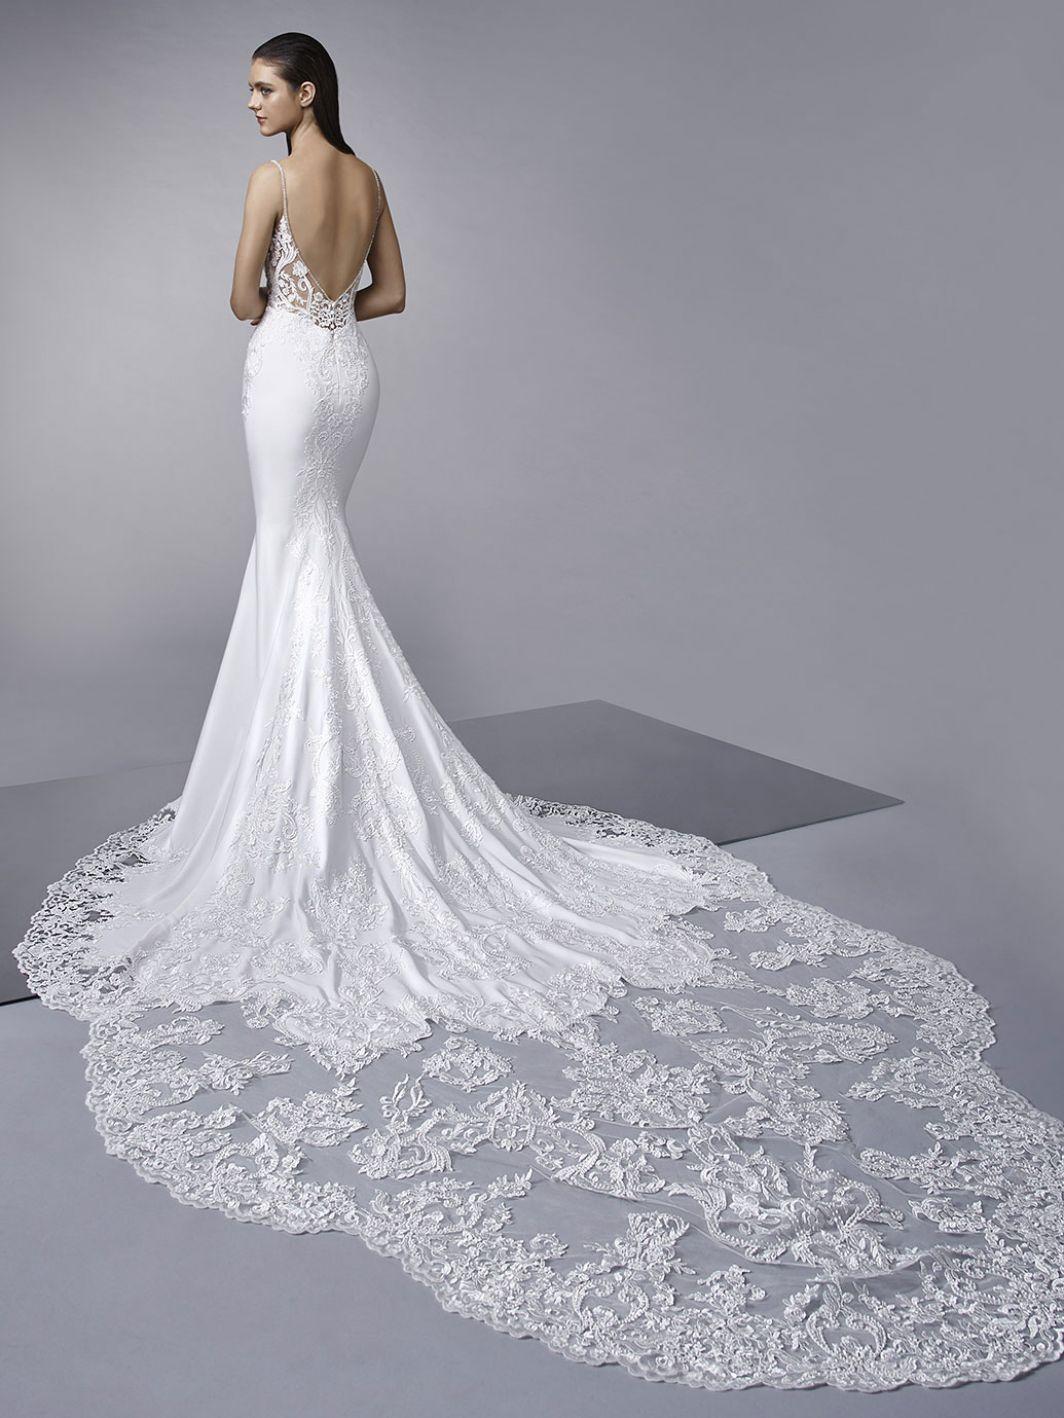 80 s dress style